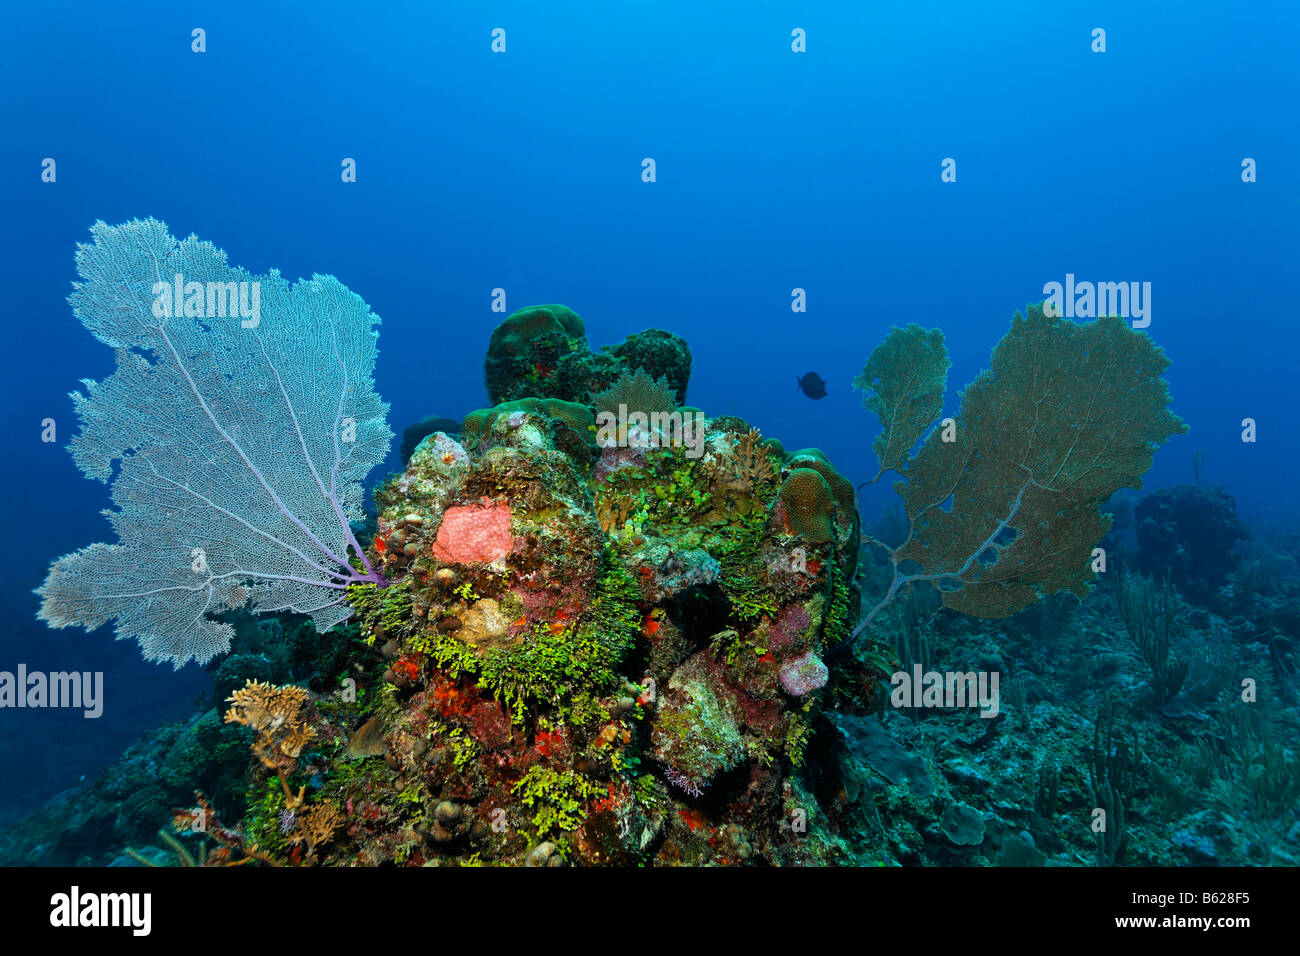 Coral Reef oder Barrier Reef lebendig mit Gorgonien, Korallen (Gorgonia Flabellum), Halimeda Algen (Halimeda s.) Stockbild